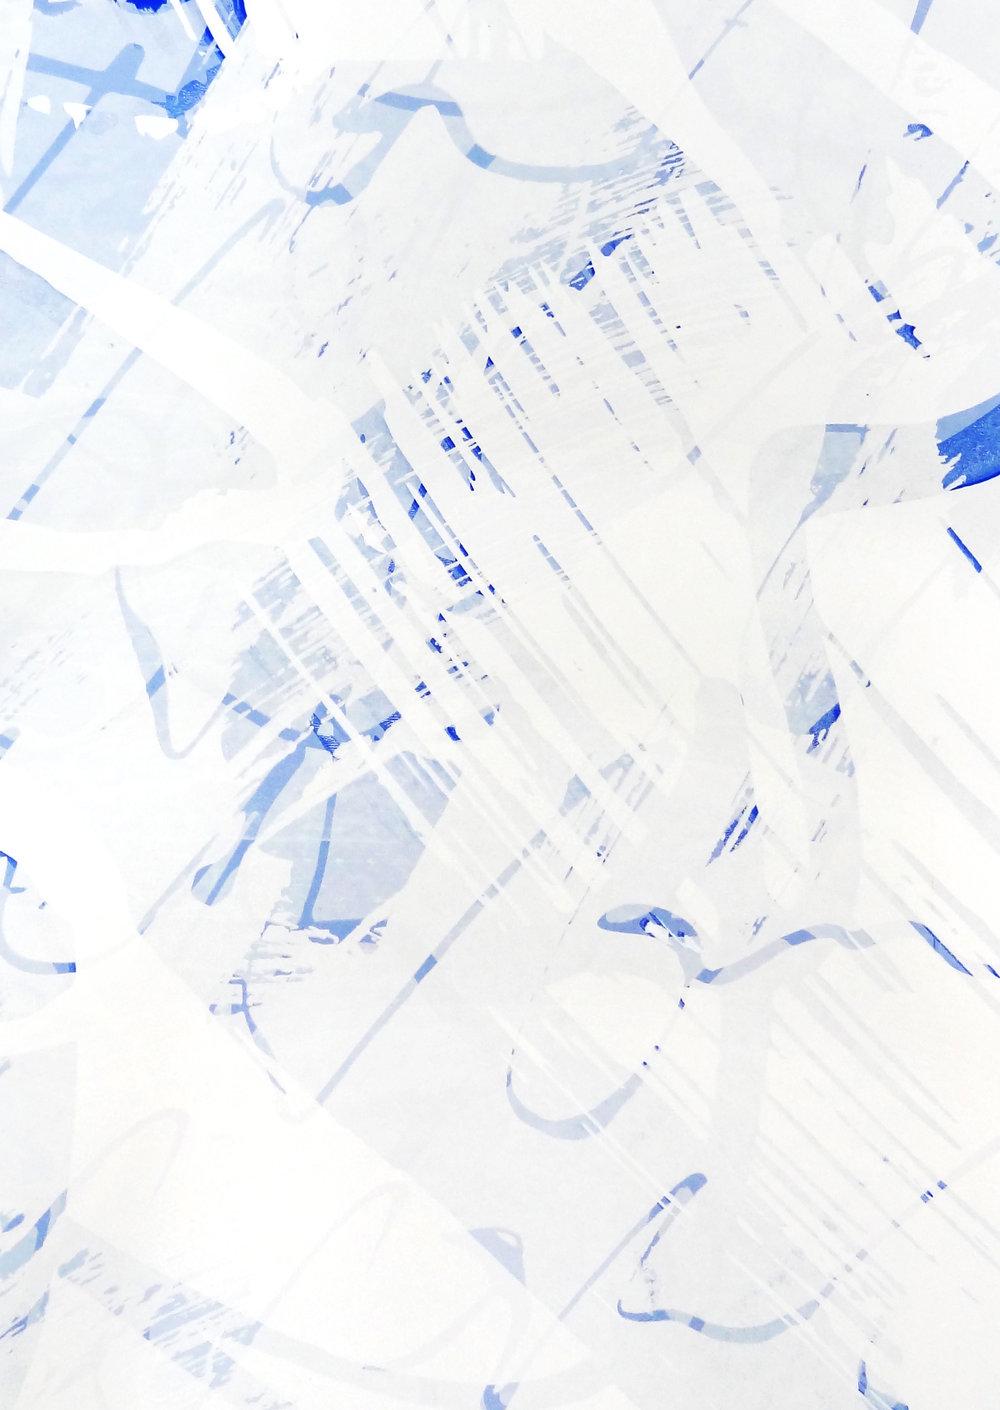 Untitled, 2018 acrylic on paper one-off screenprint 57 x 40 cm (24-18)